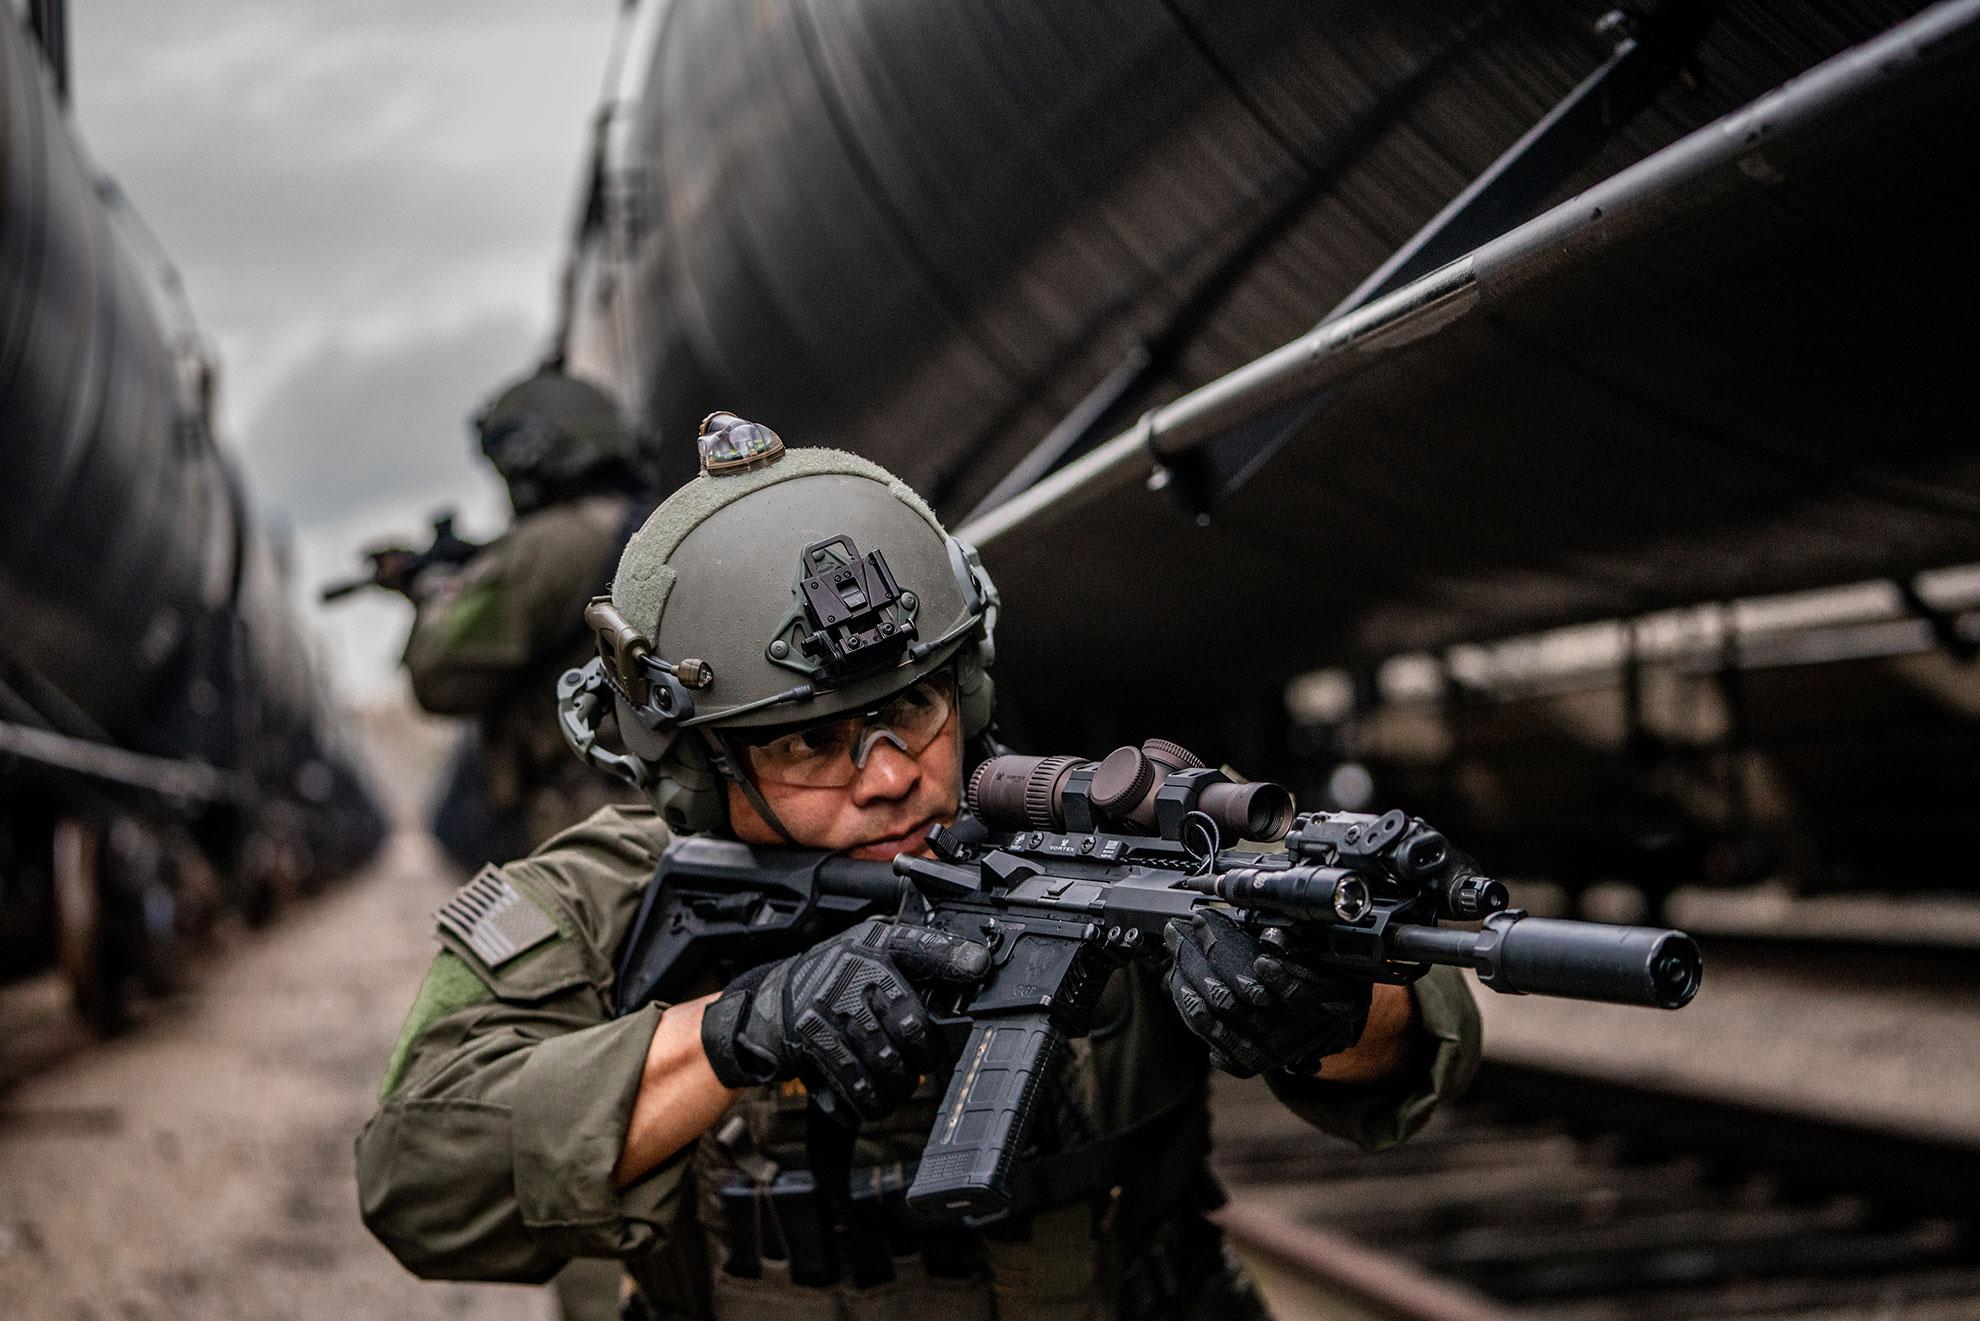 SureFire SOCOM suppressors trusted by elite combat units